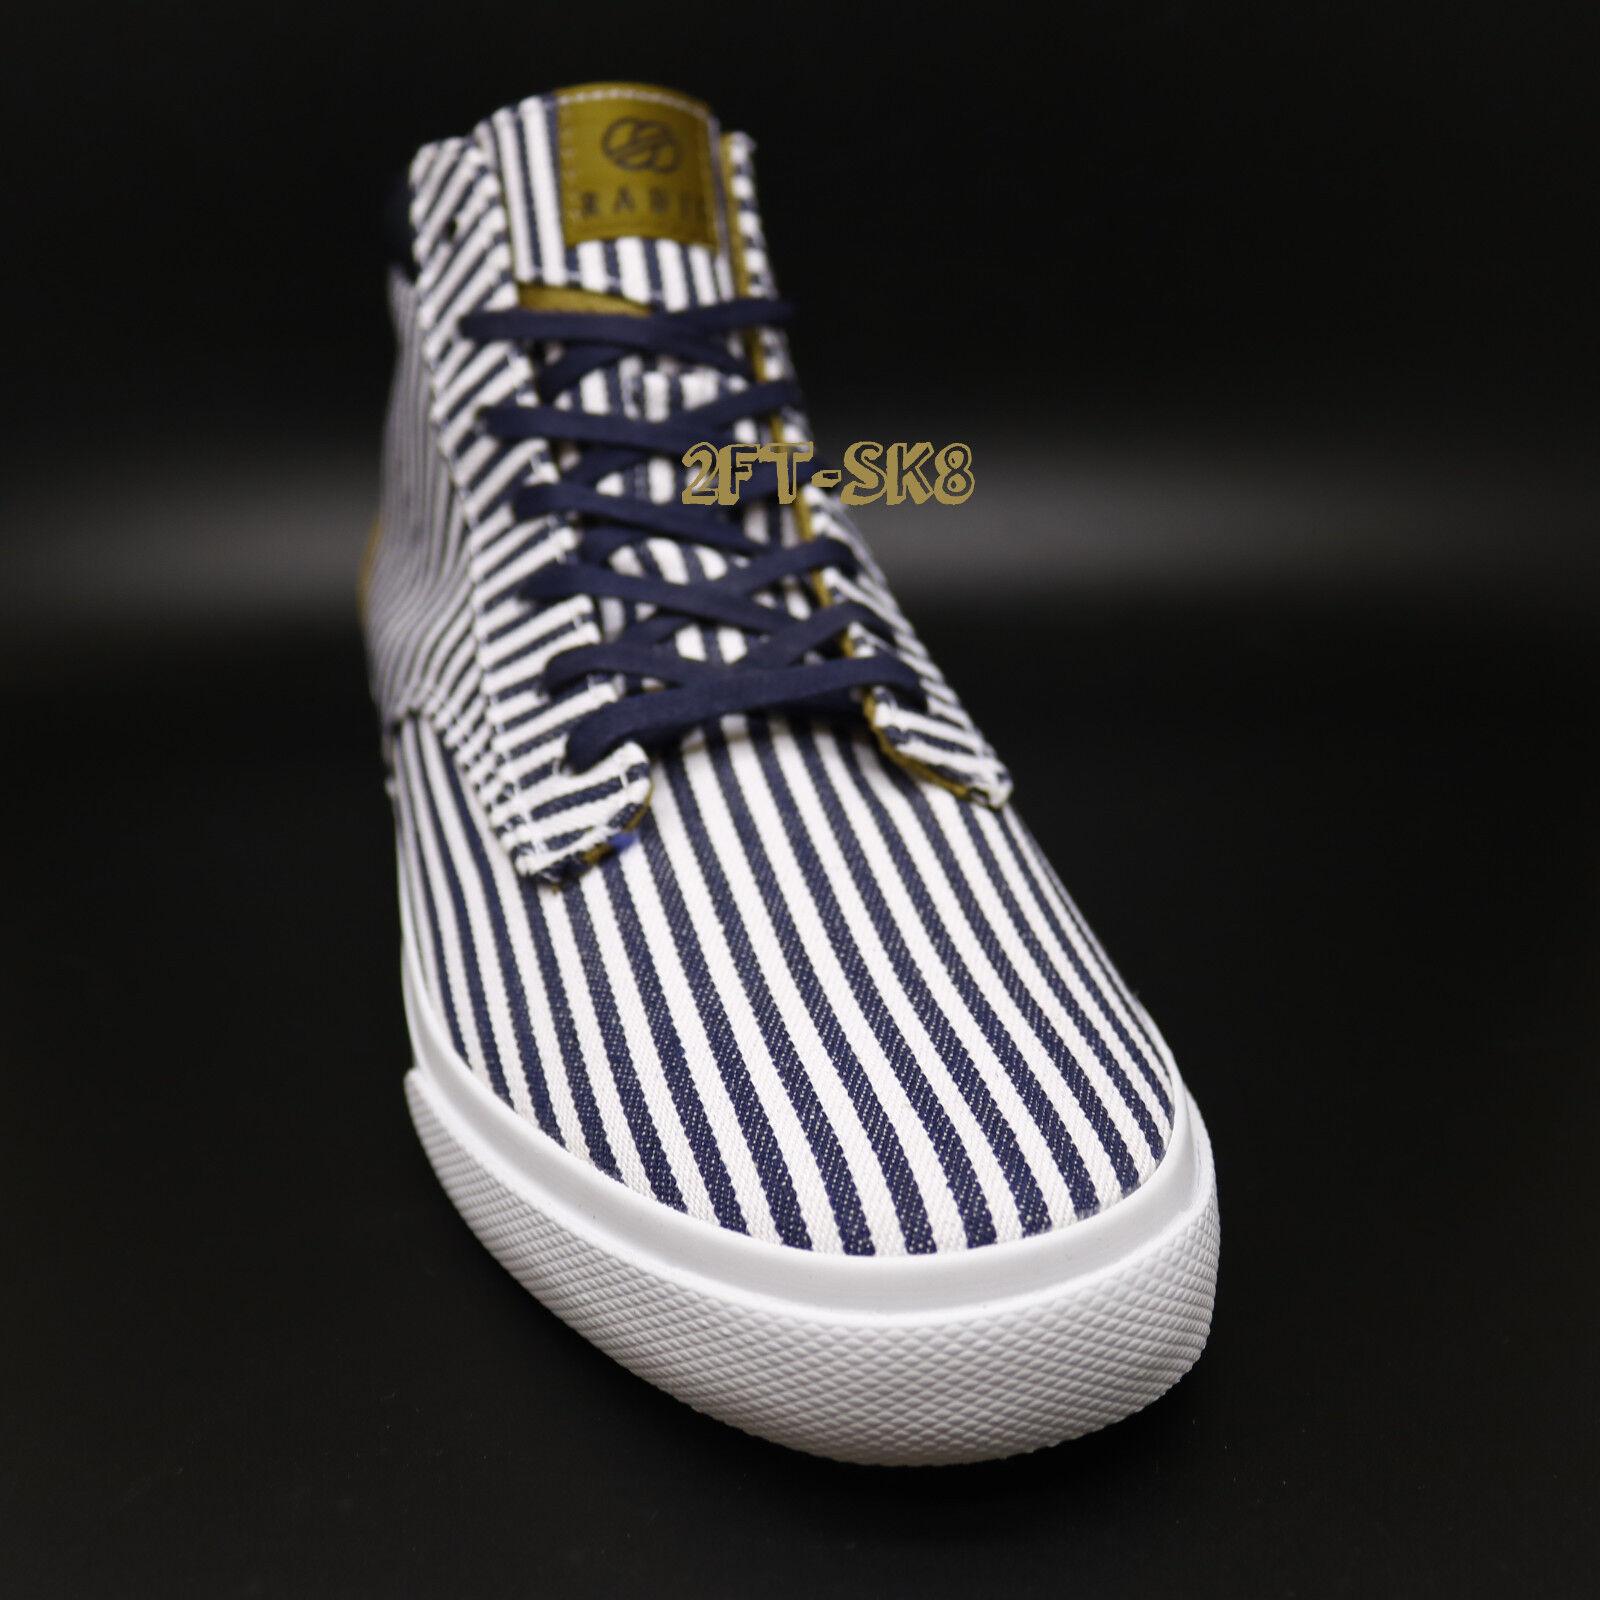 RADII FOOTWEAR TOP BASIC NAVY CREAM STRIPES HIGH TOP FOOTWEAR Schuhe/straight jacket 85181.195 e38e85